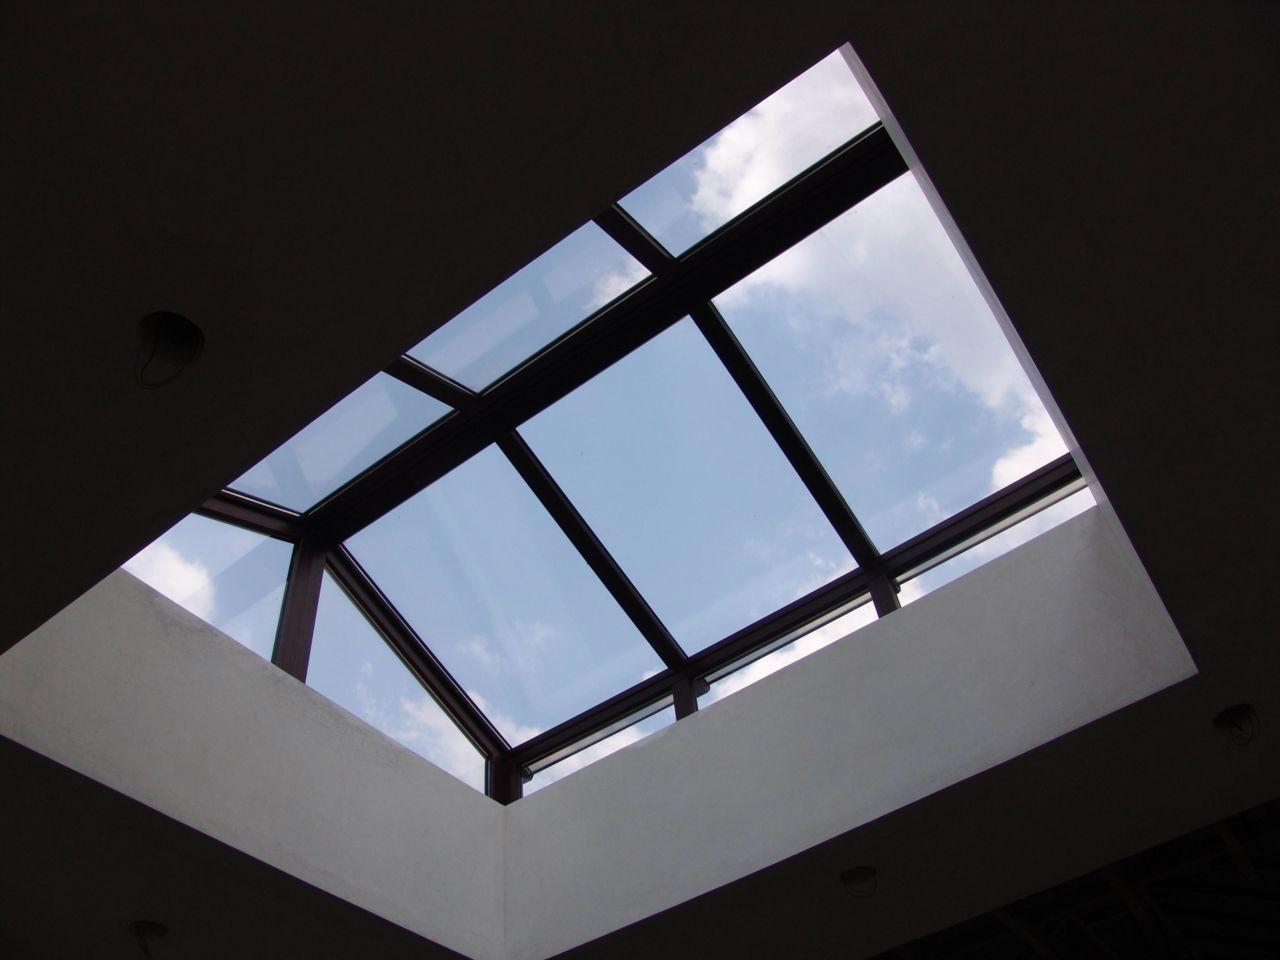 Iluminacion natural en tu casa con los tragaluces o for Claraboyas para techos